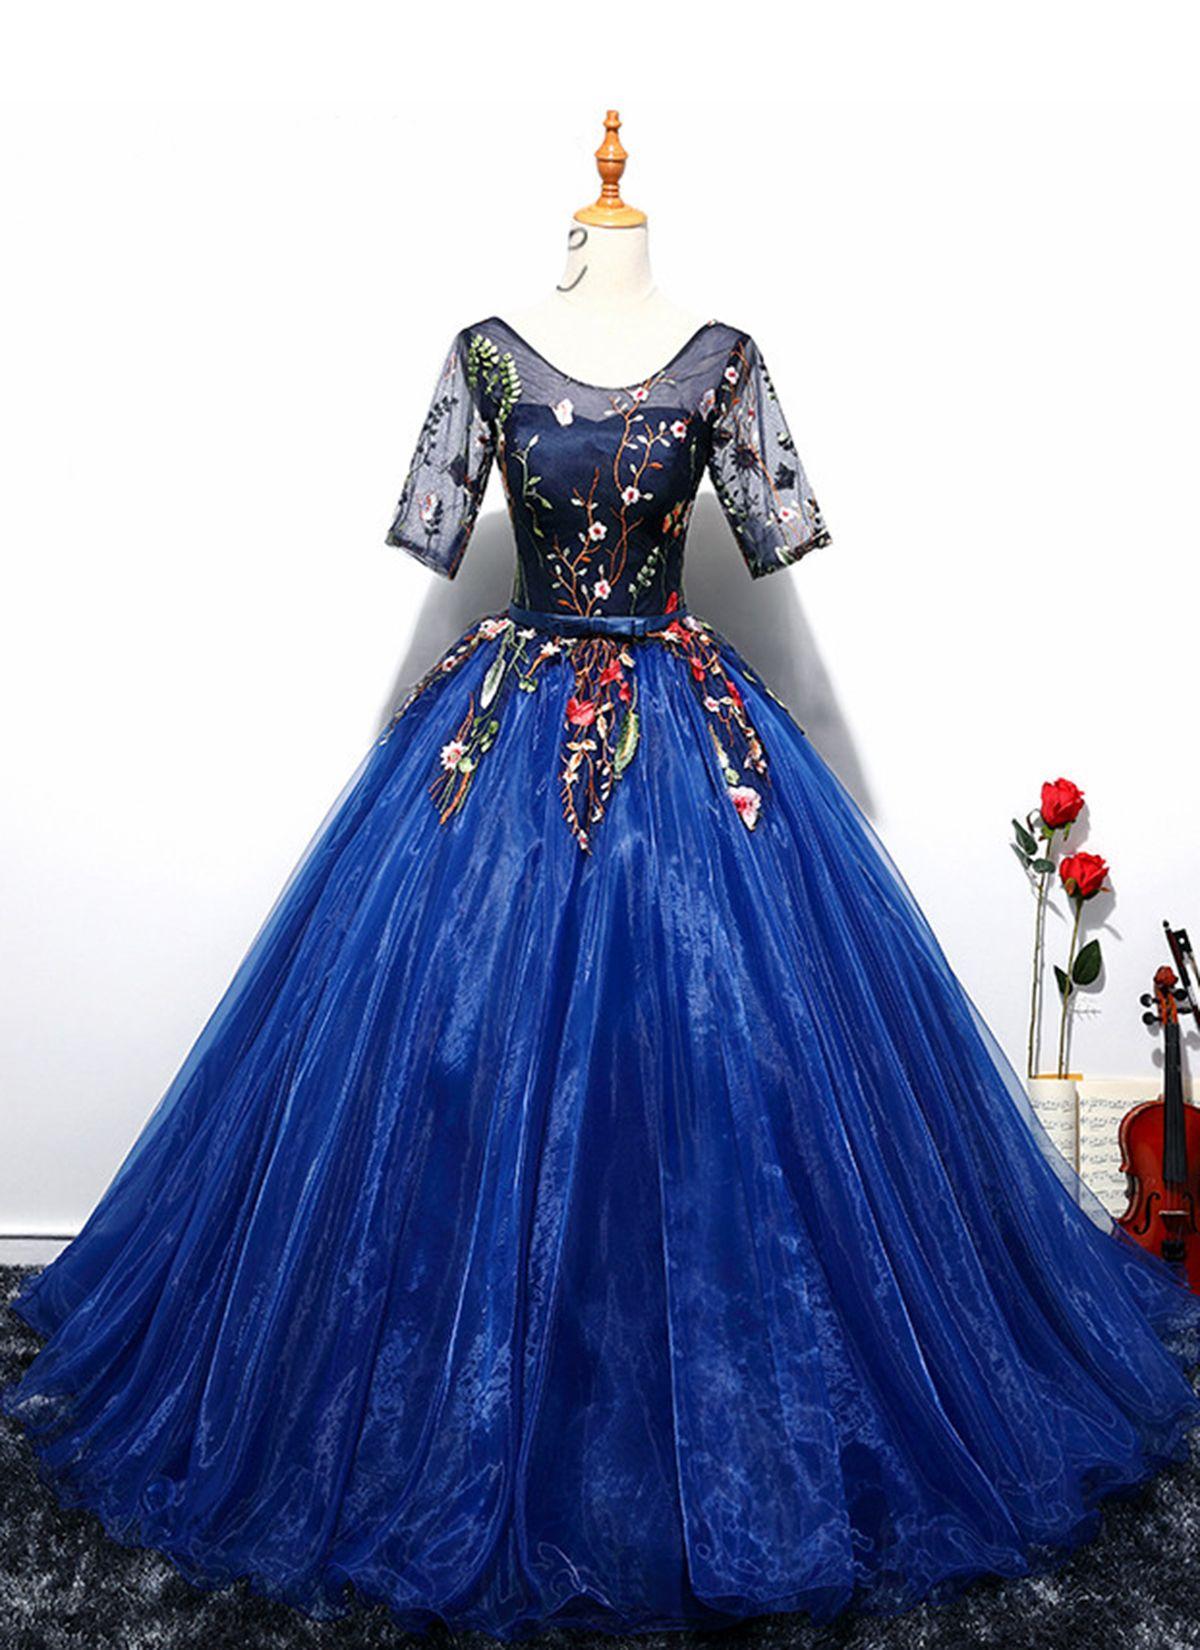 Royal blue puffy flower formal long evening dress prom gown wedding